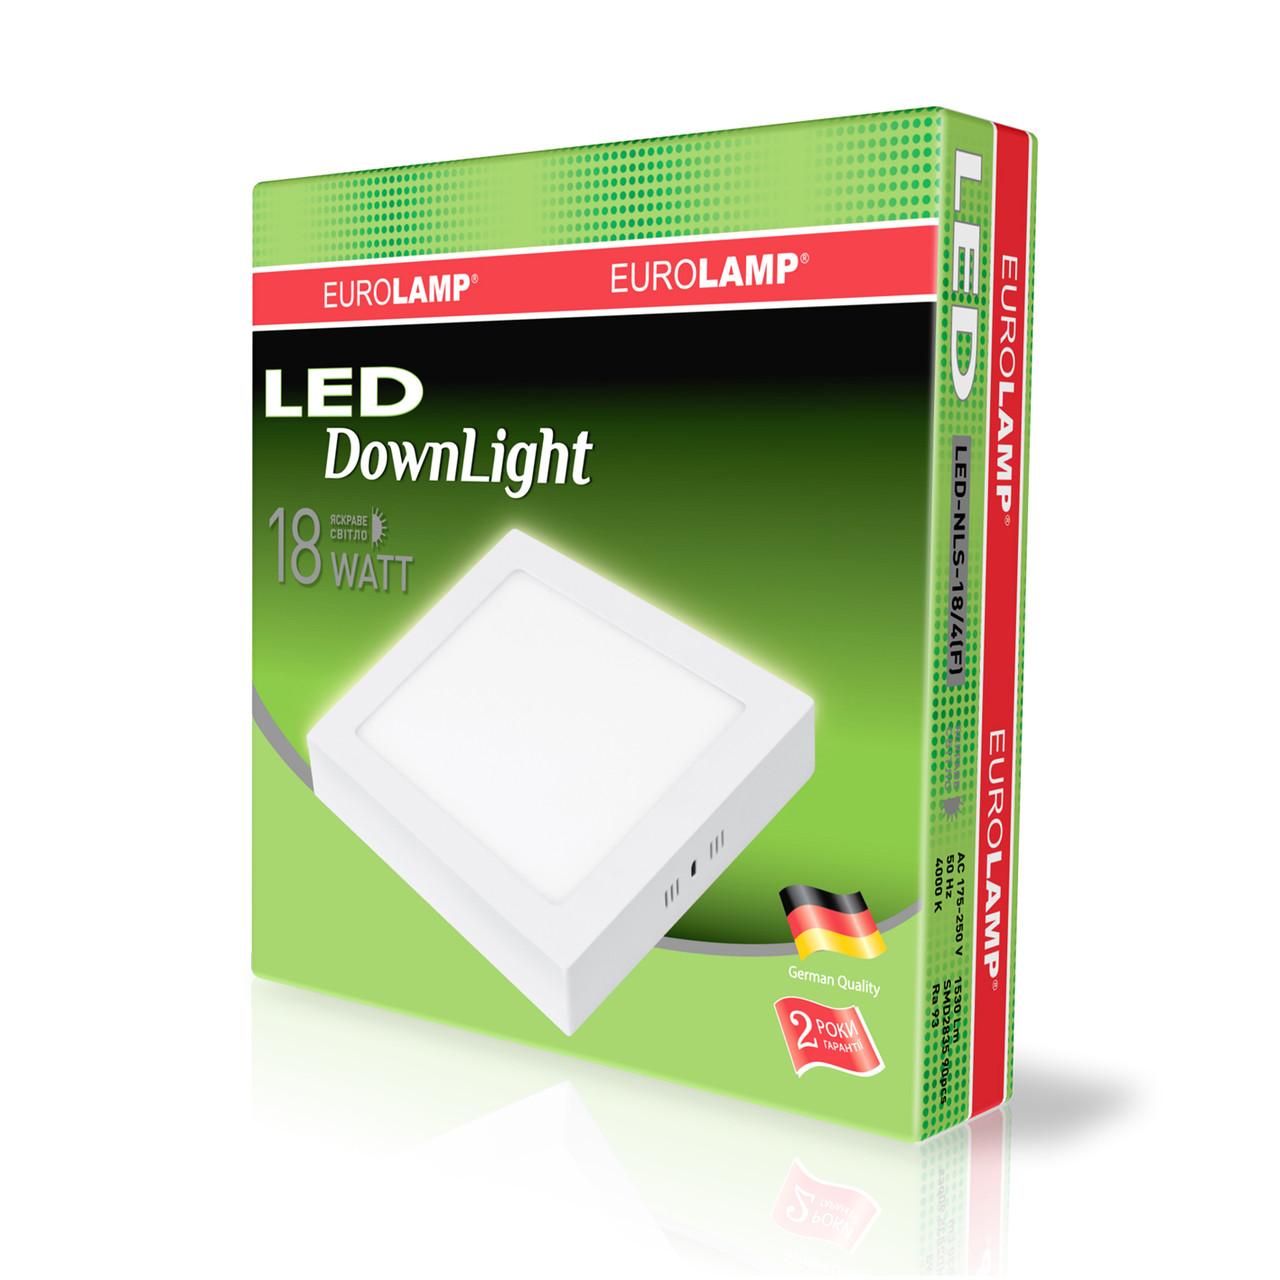 LED-светильник Eurolamp Downlight NEW 18W 1530Lm Ra93 4000K квадратный